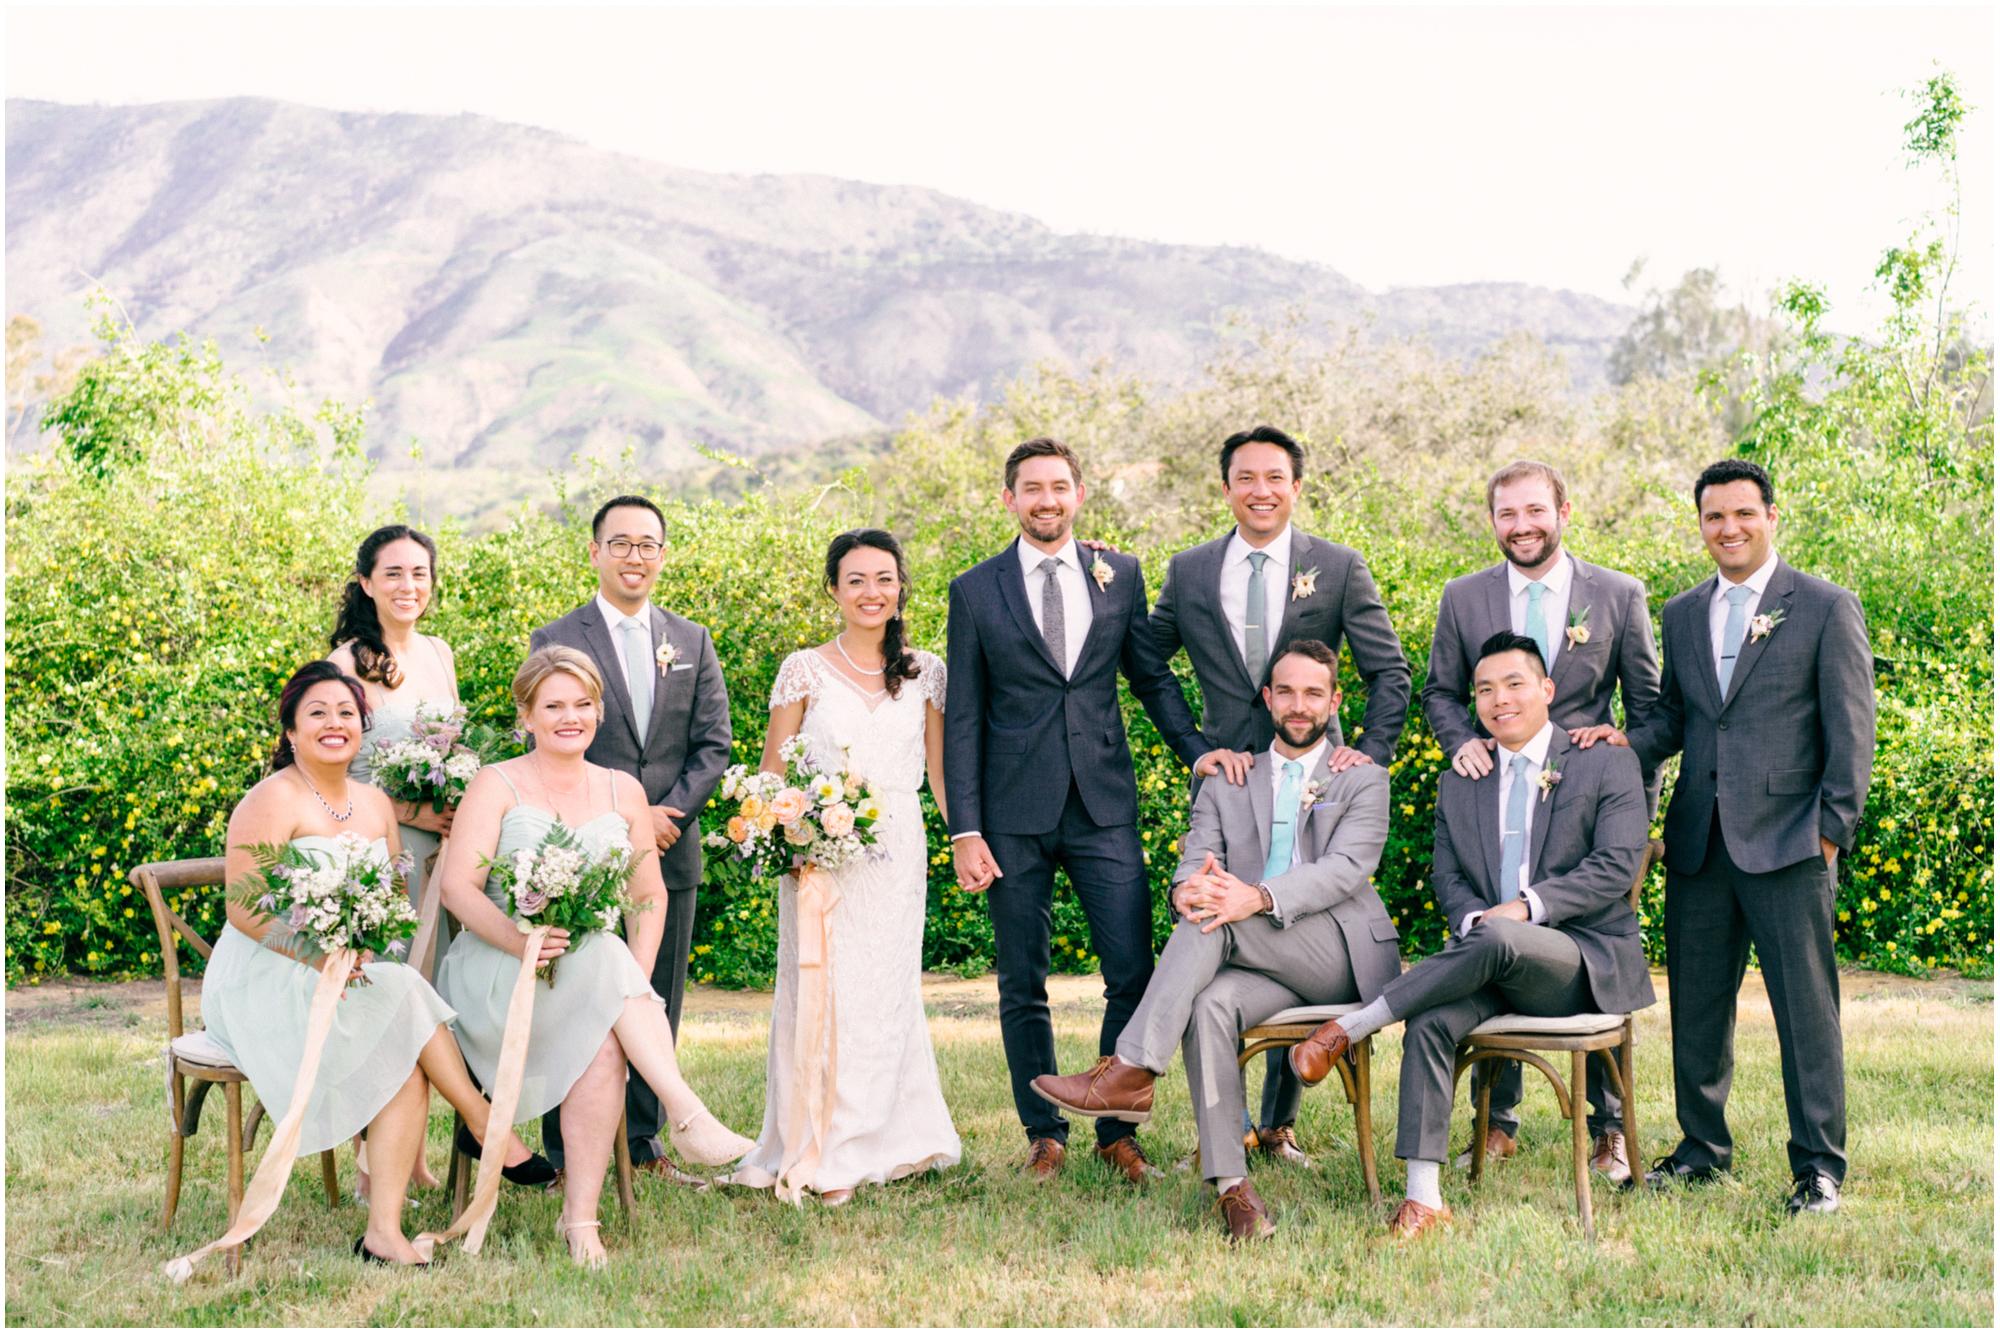 Los_Angeles_Wedding_Photographer_Ojai_Wedding_Pinnel_Photography-03.jpg